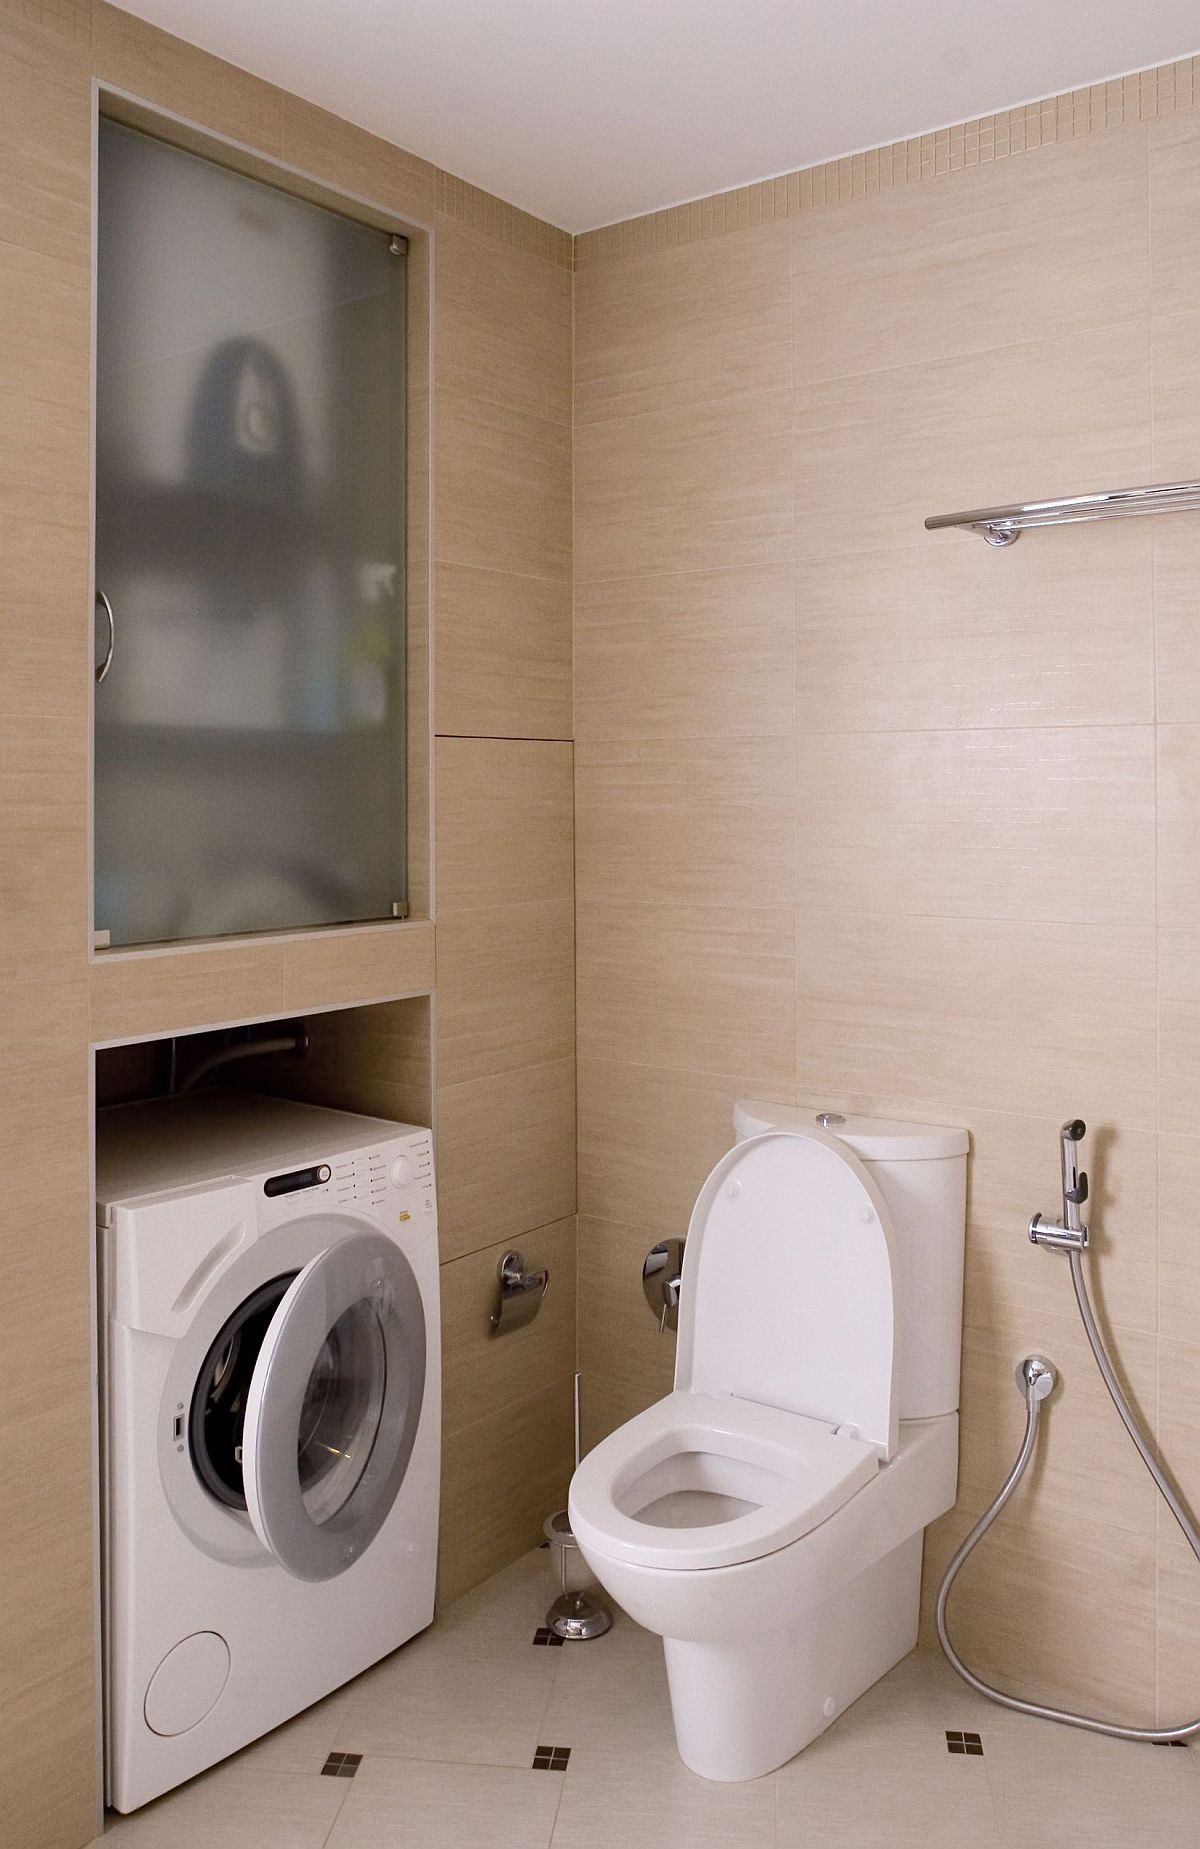 adelaparvu.com despre masina de spalat rufe in baie (2)